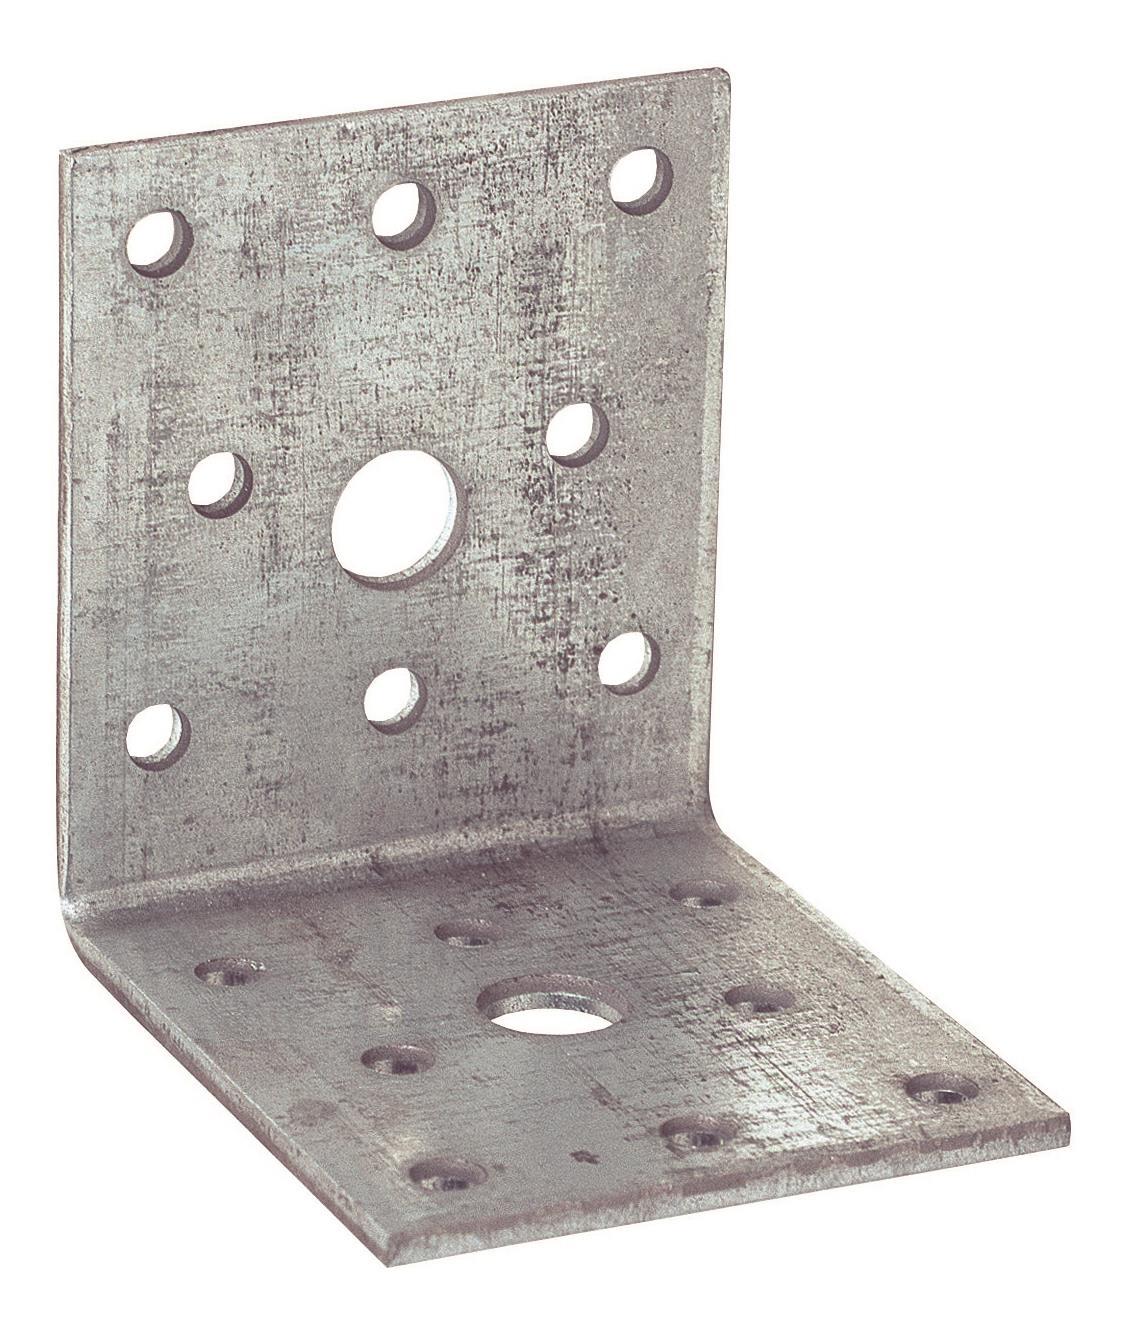 Joma 4200000 Vinkelbeslag 50-pack ETA-09/0316 30 x 65 x 65 x 55 mm